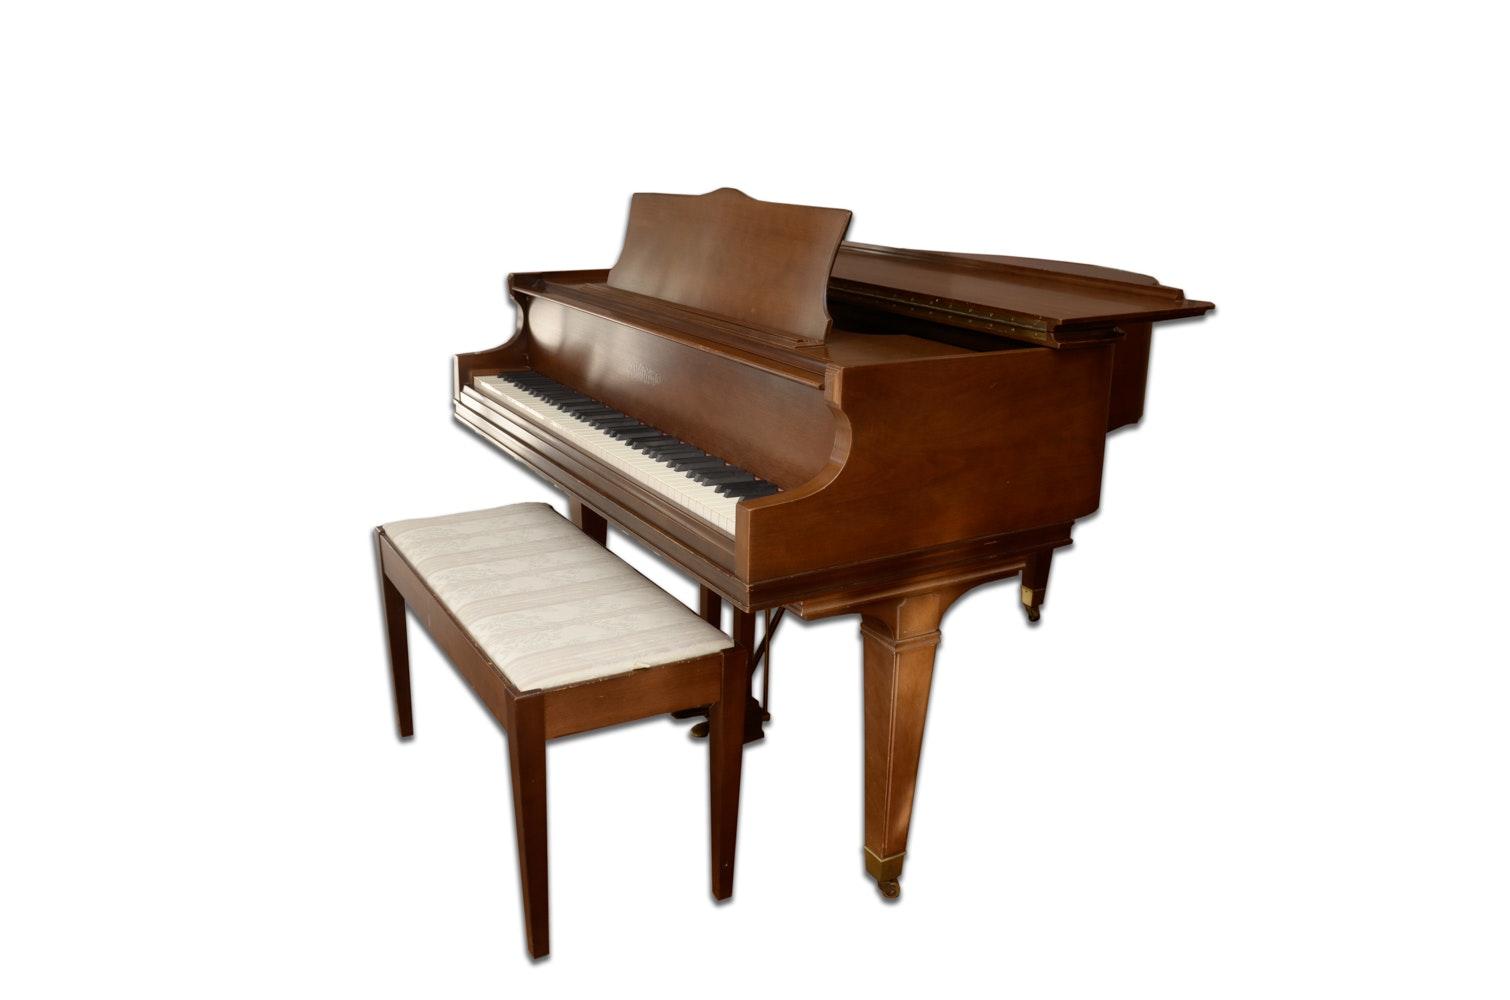 Chickering Walnut Baby Grand Piano